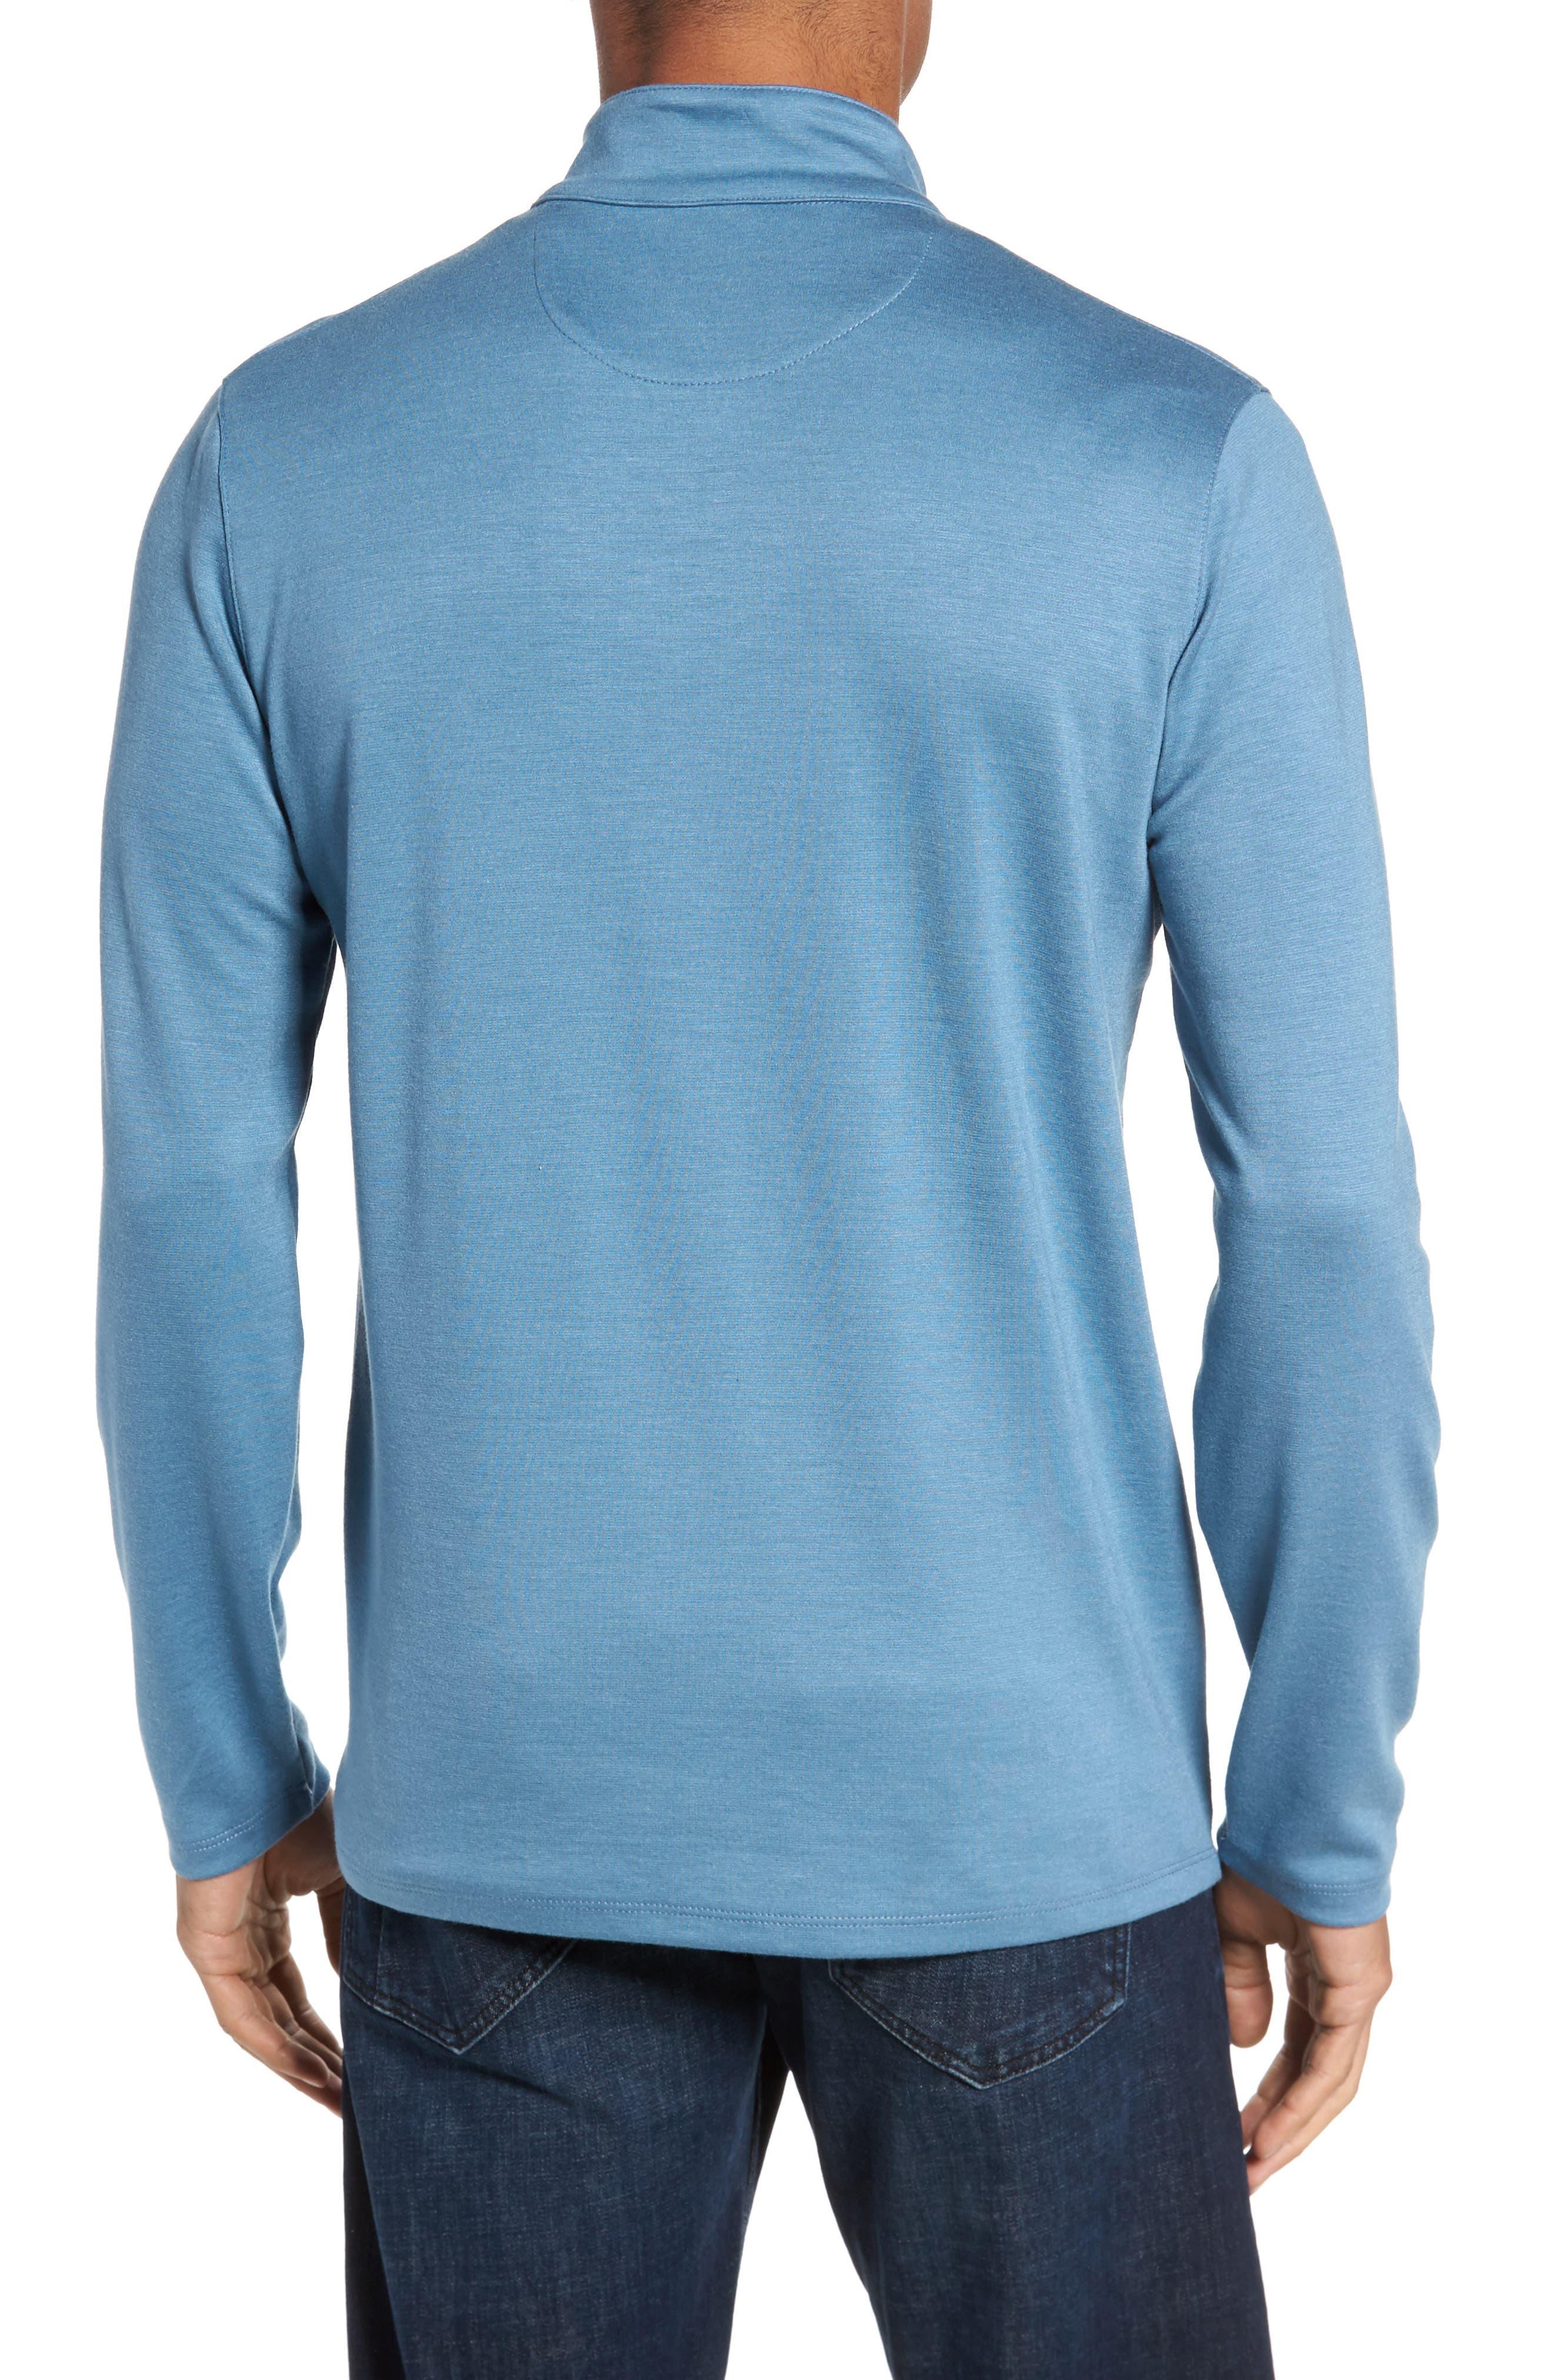 Quarter Zip Pullover,                             Alternate thumbnail 2, color,                             Blue